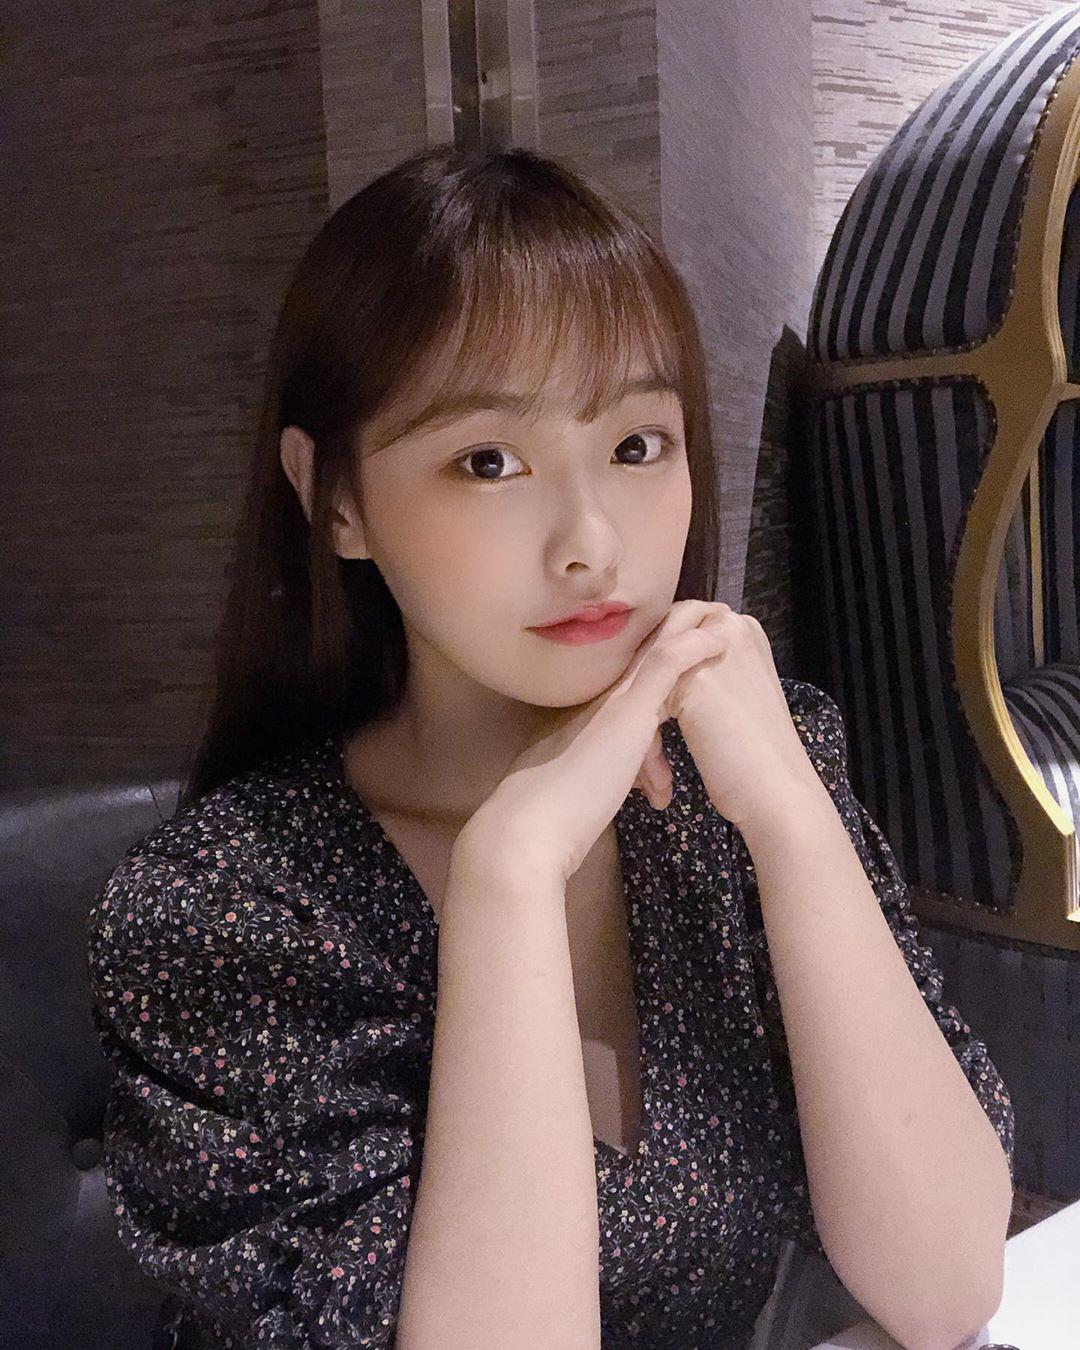 HB8ZHMVm o - IG正妹—湘湘